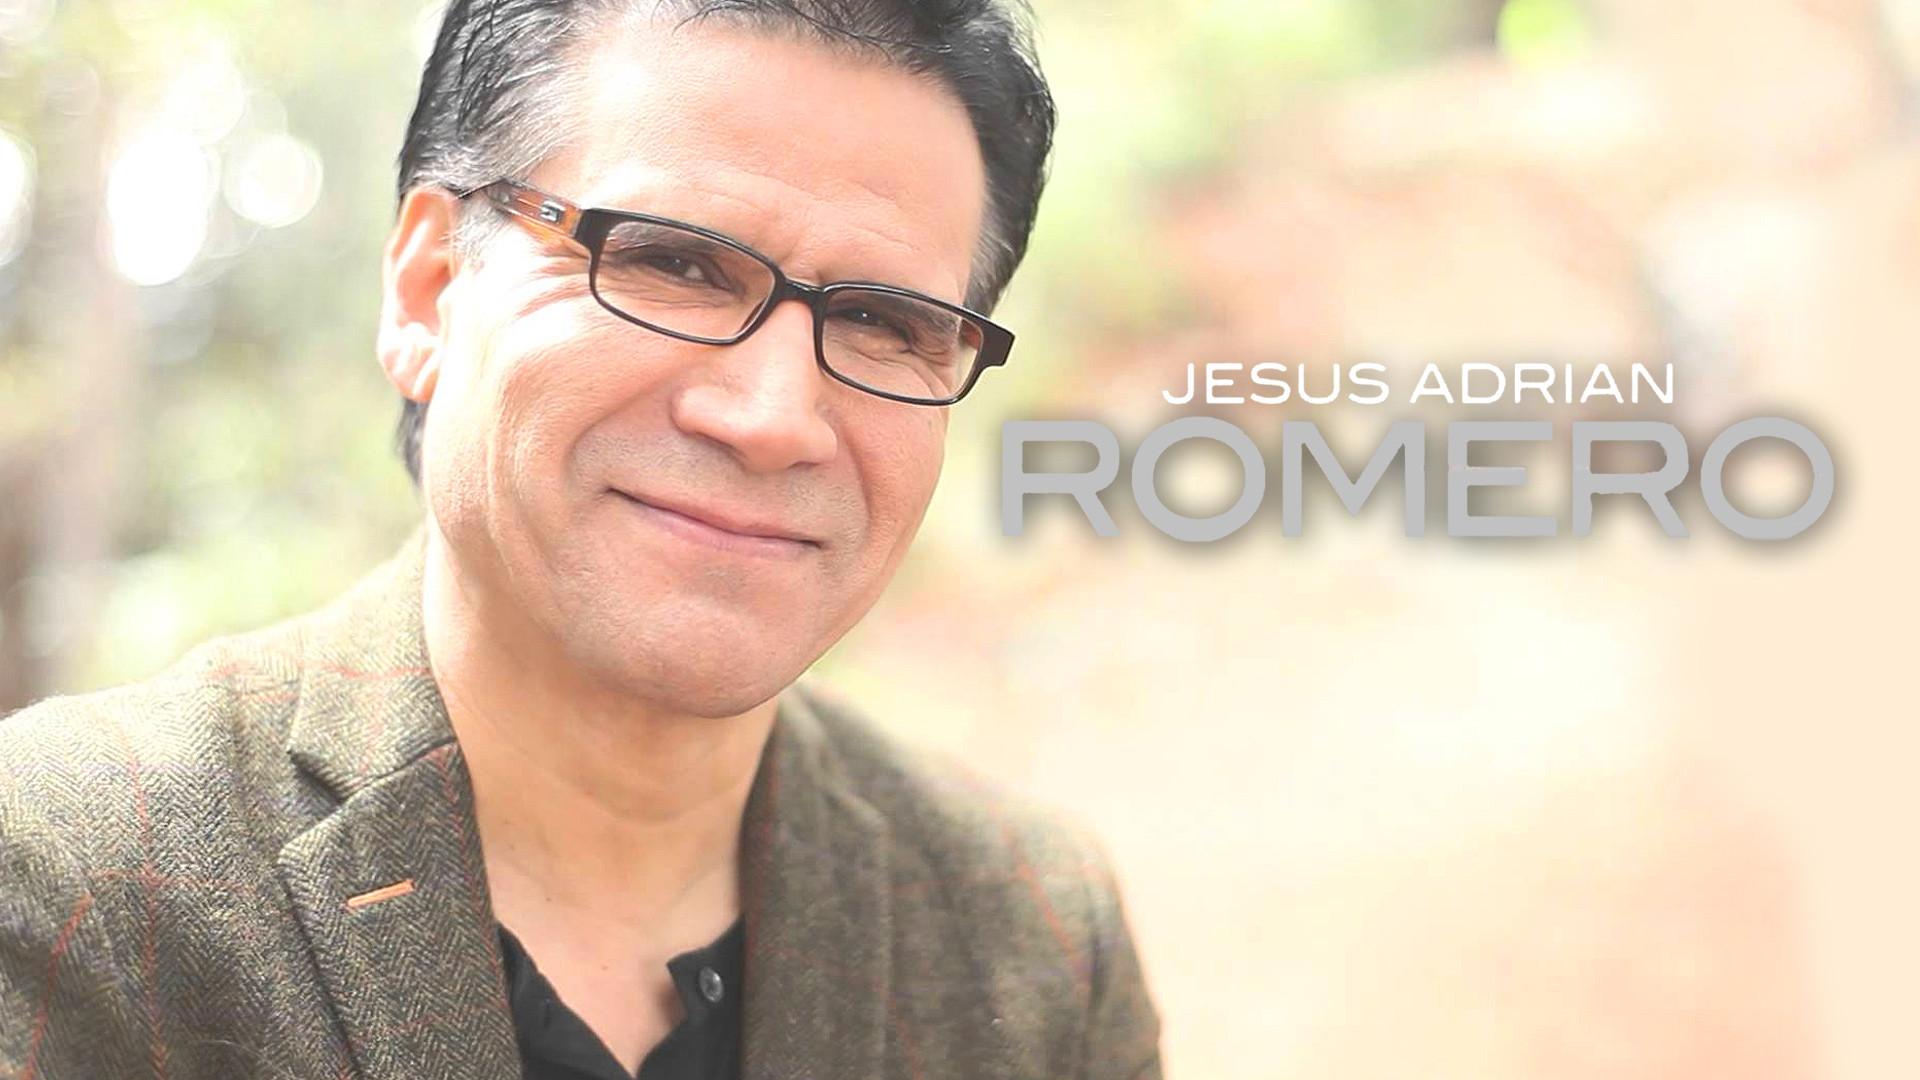 jesus-adrian-romero-6.jpg